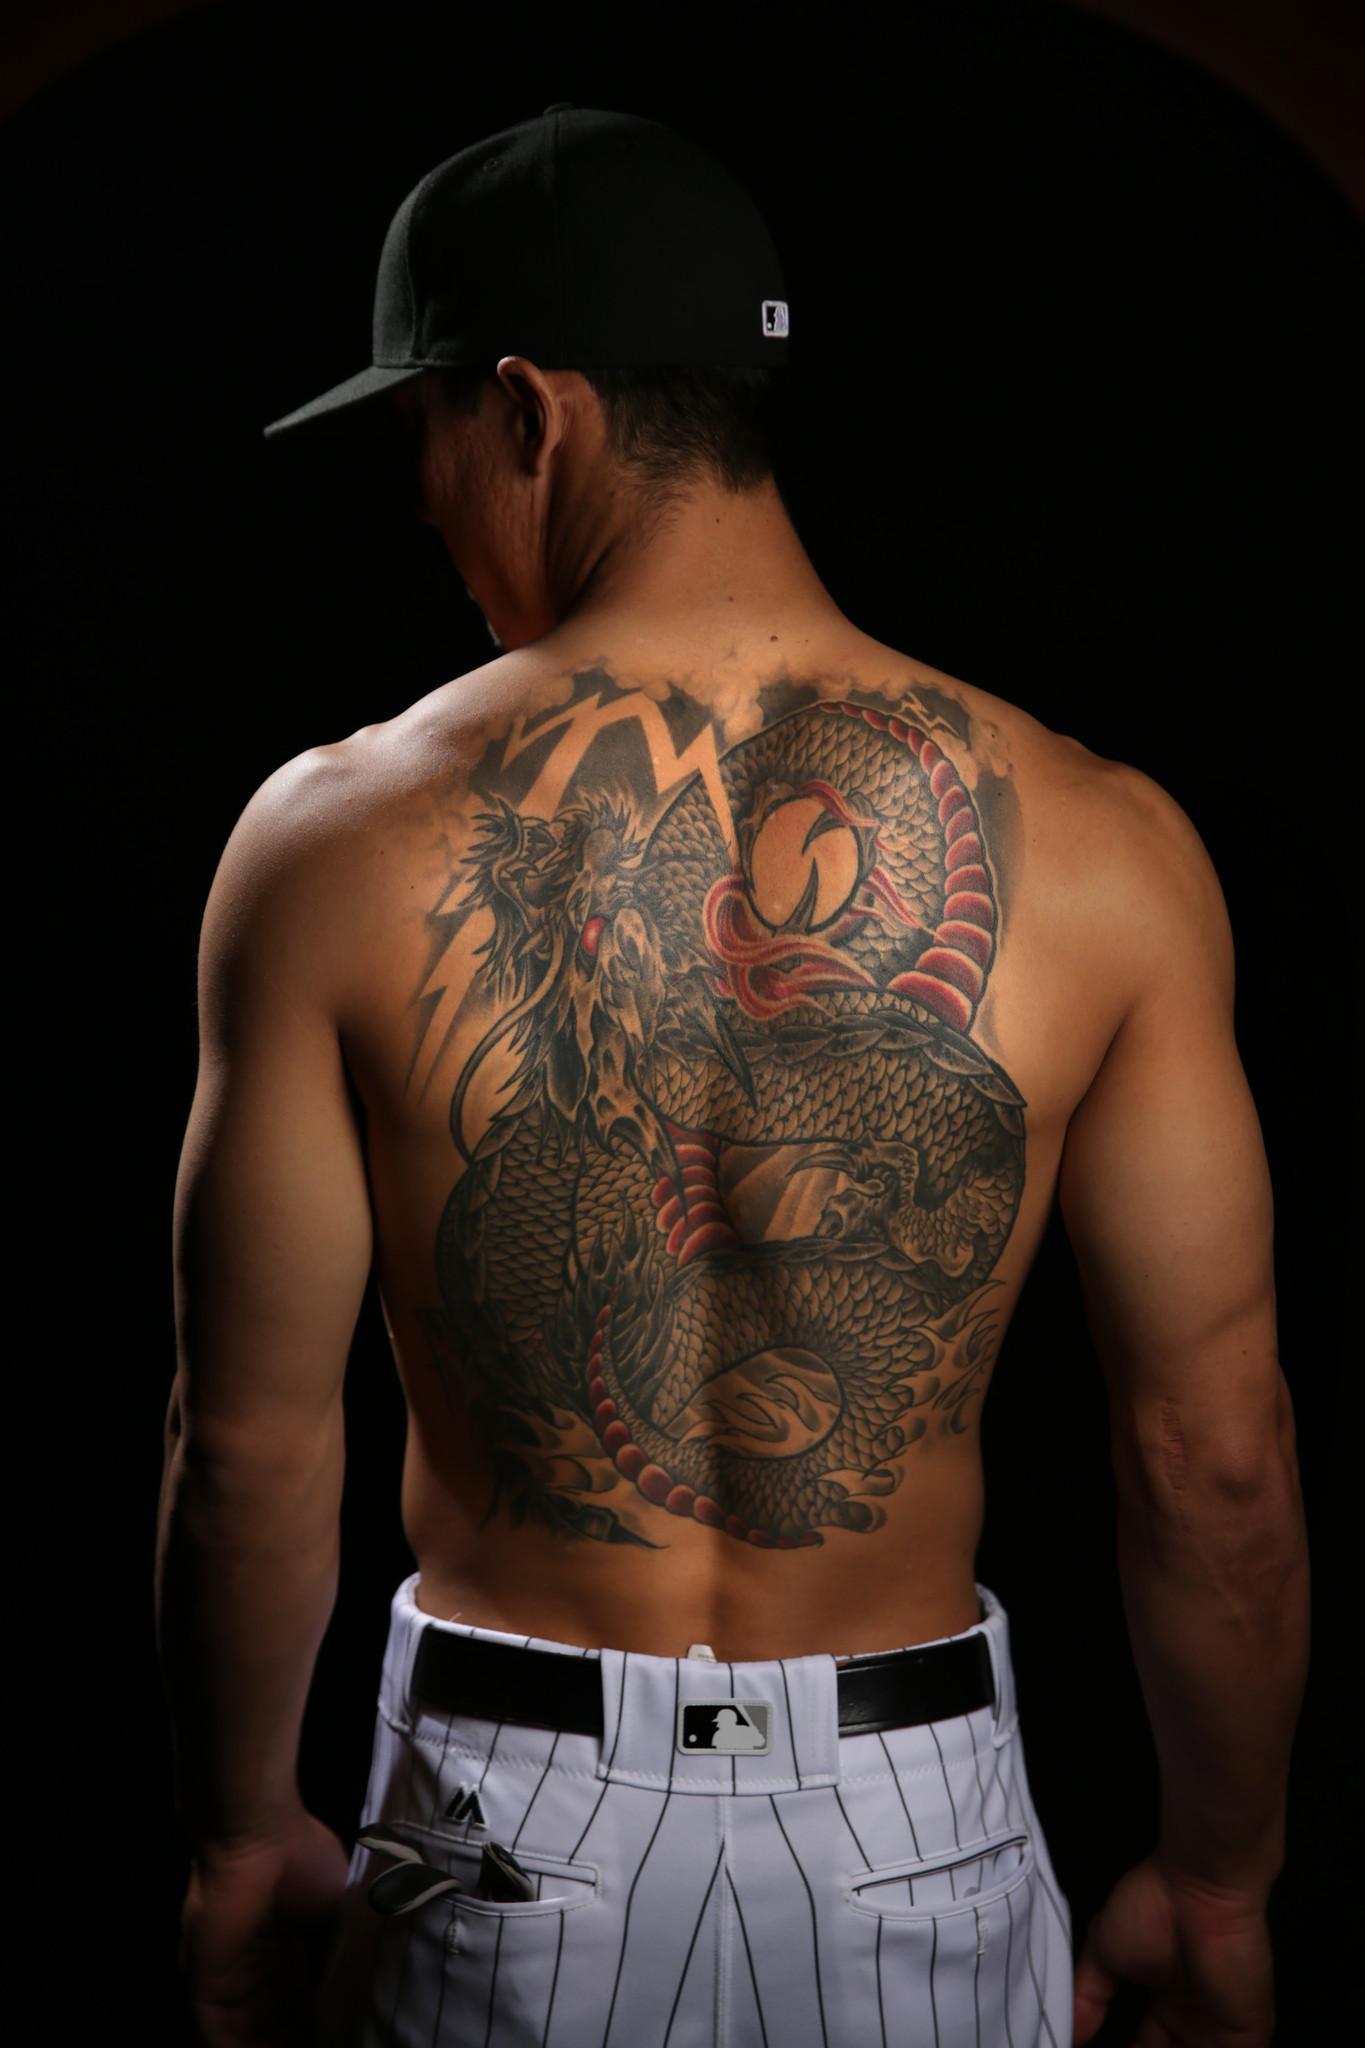 Ct-tyler-saladino-tattoo-white-sox-spt-0531-20160530